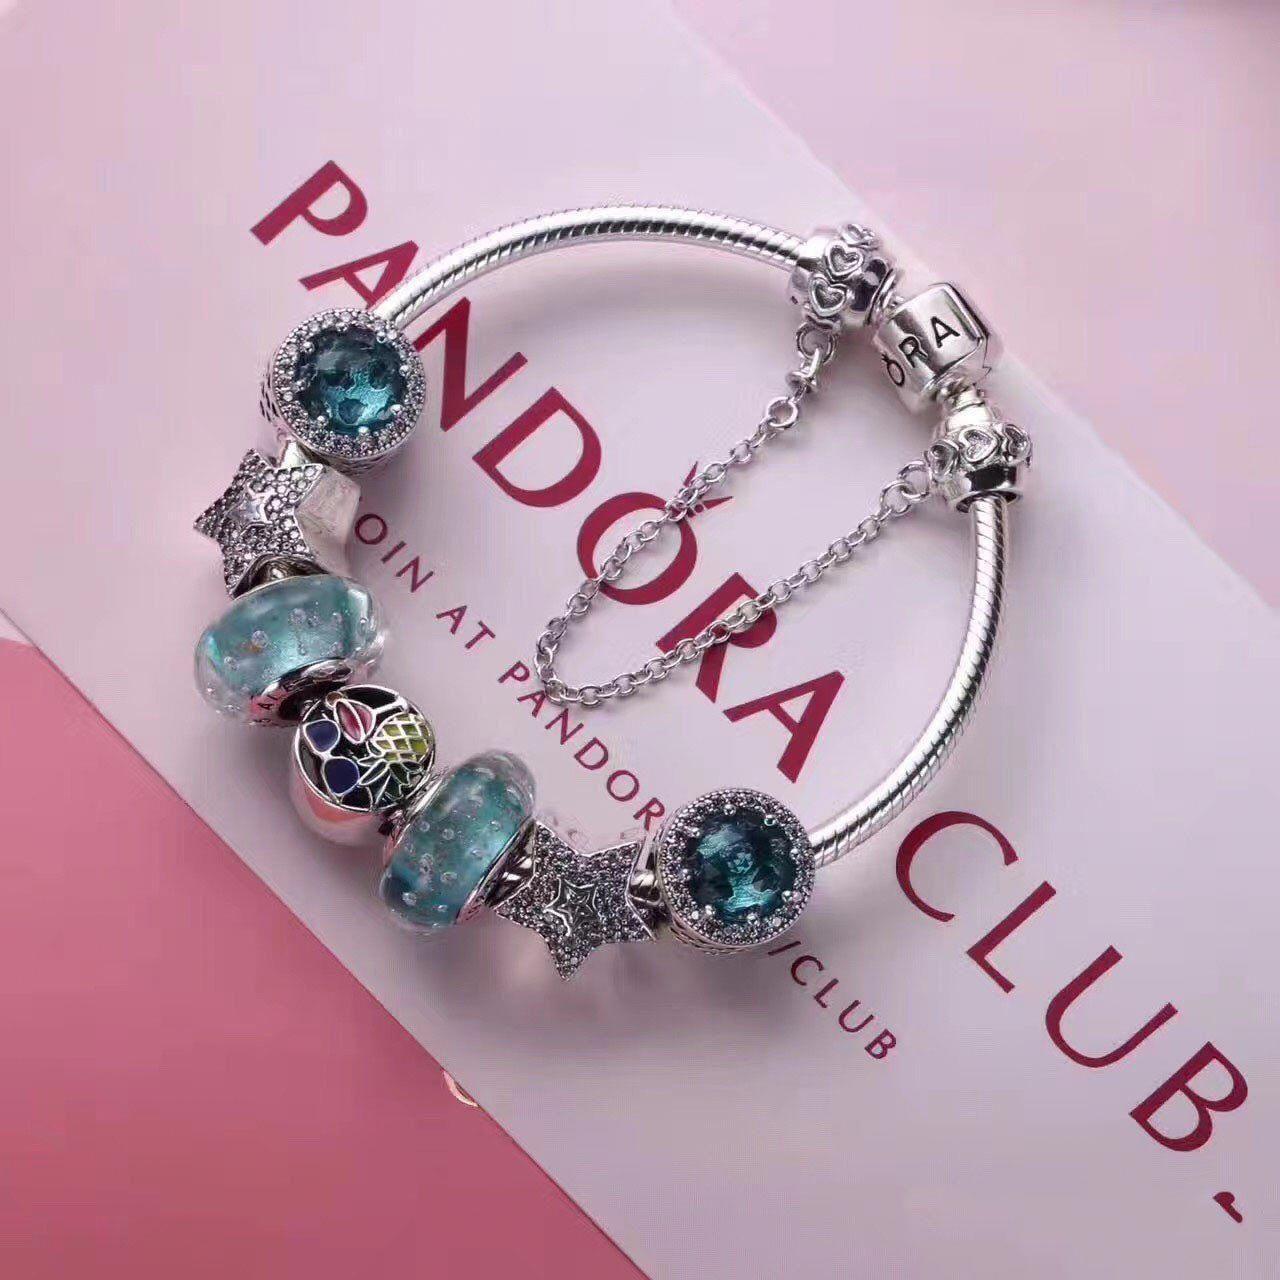 925 sliver Pandora charm bracelet with 7 pcs charms deluxe blue ...